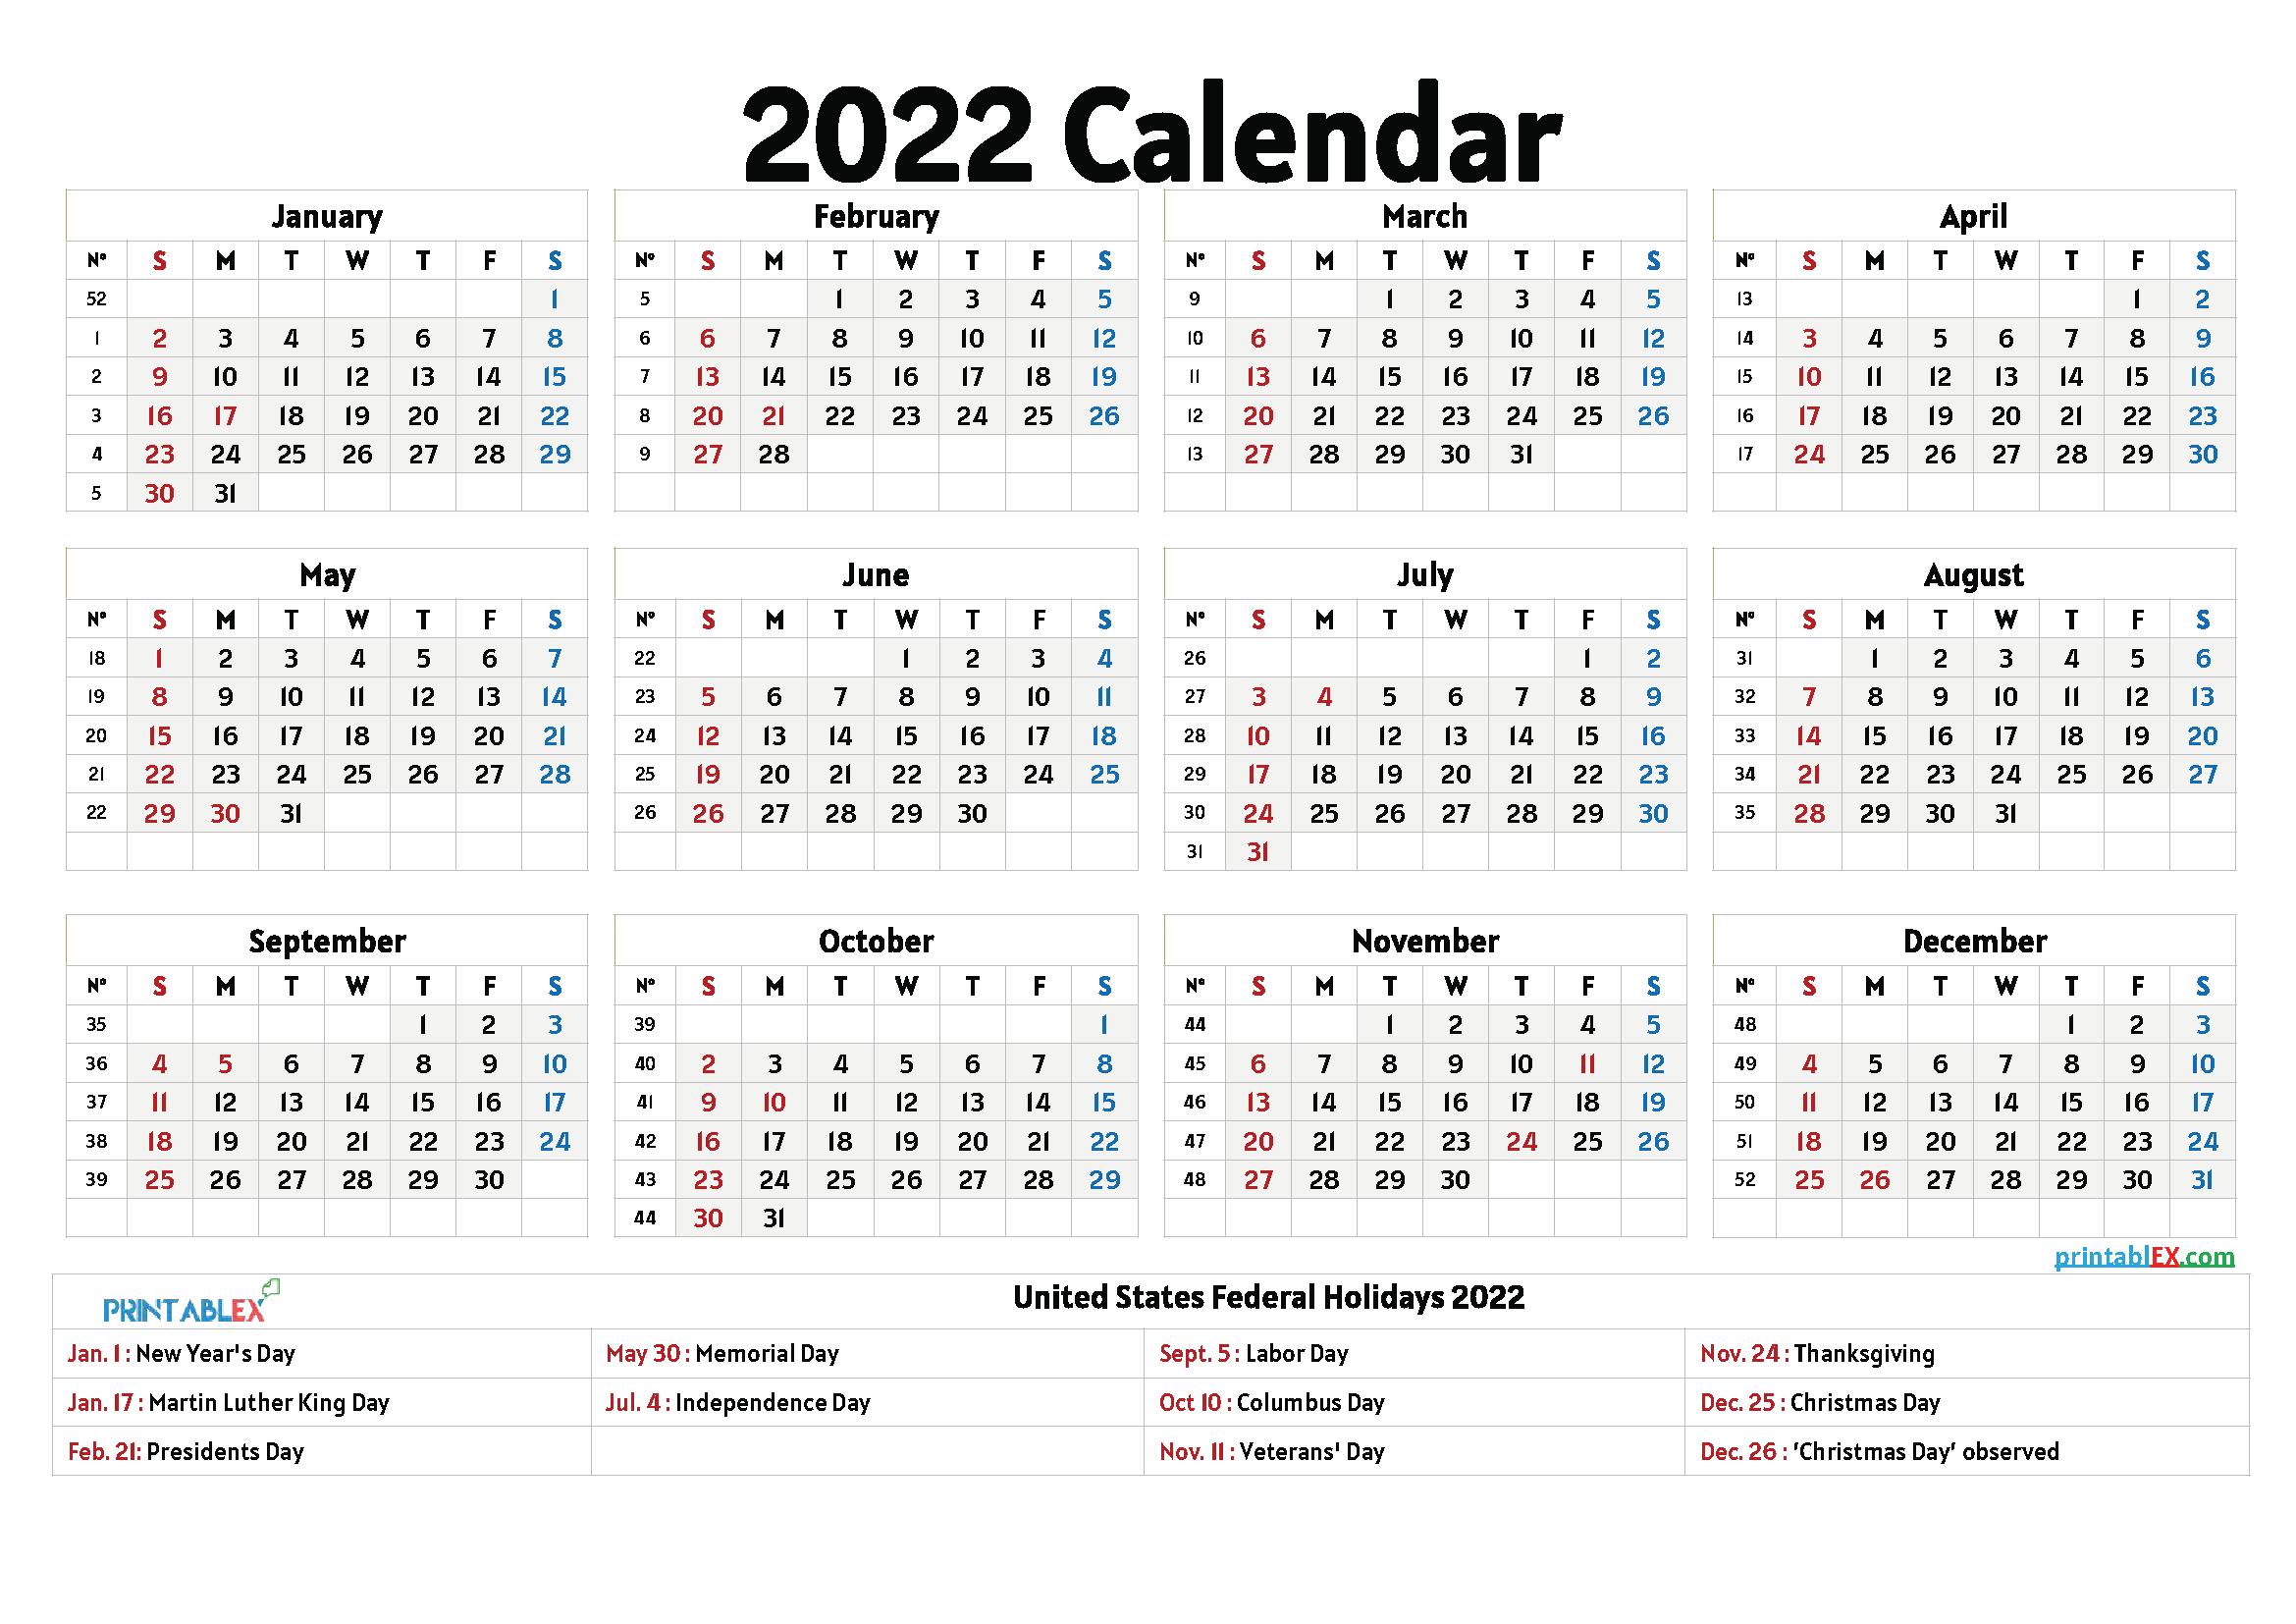 Connections Academy 2021 2022 Calendar | Calendar 2021 inside Free Printable Julian Date Calendar 2022